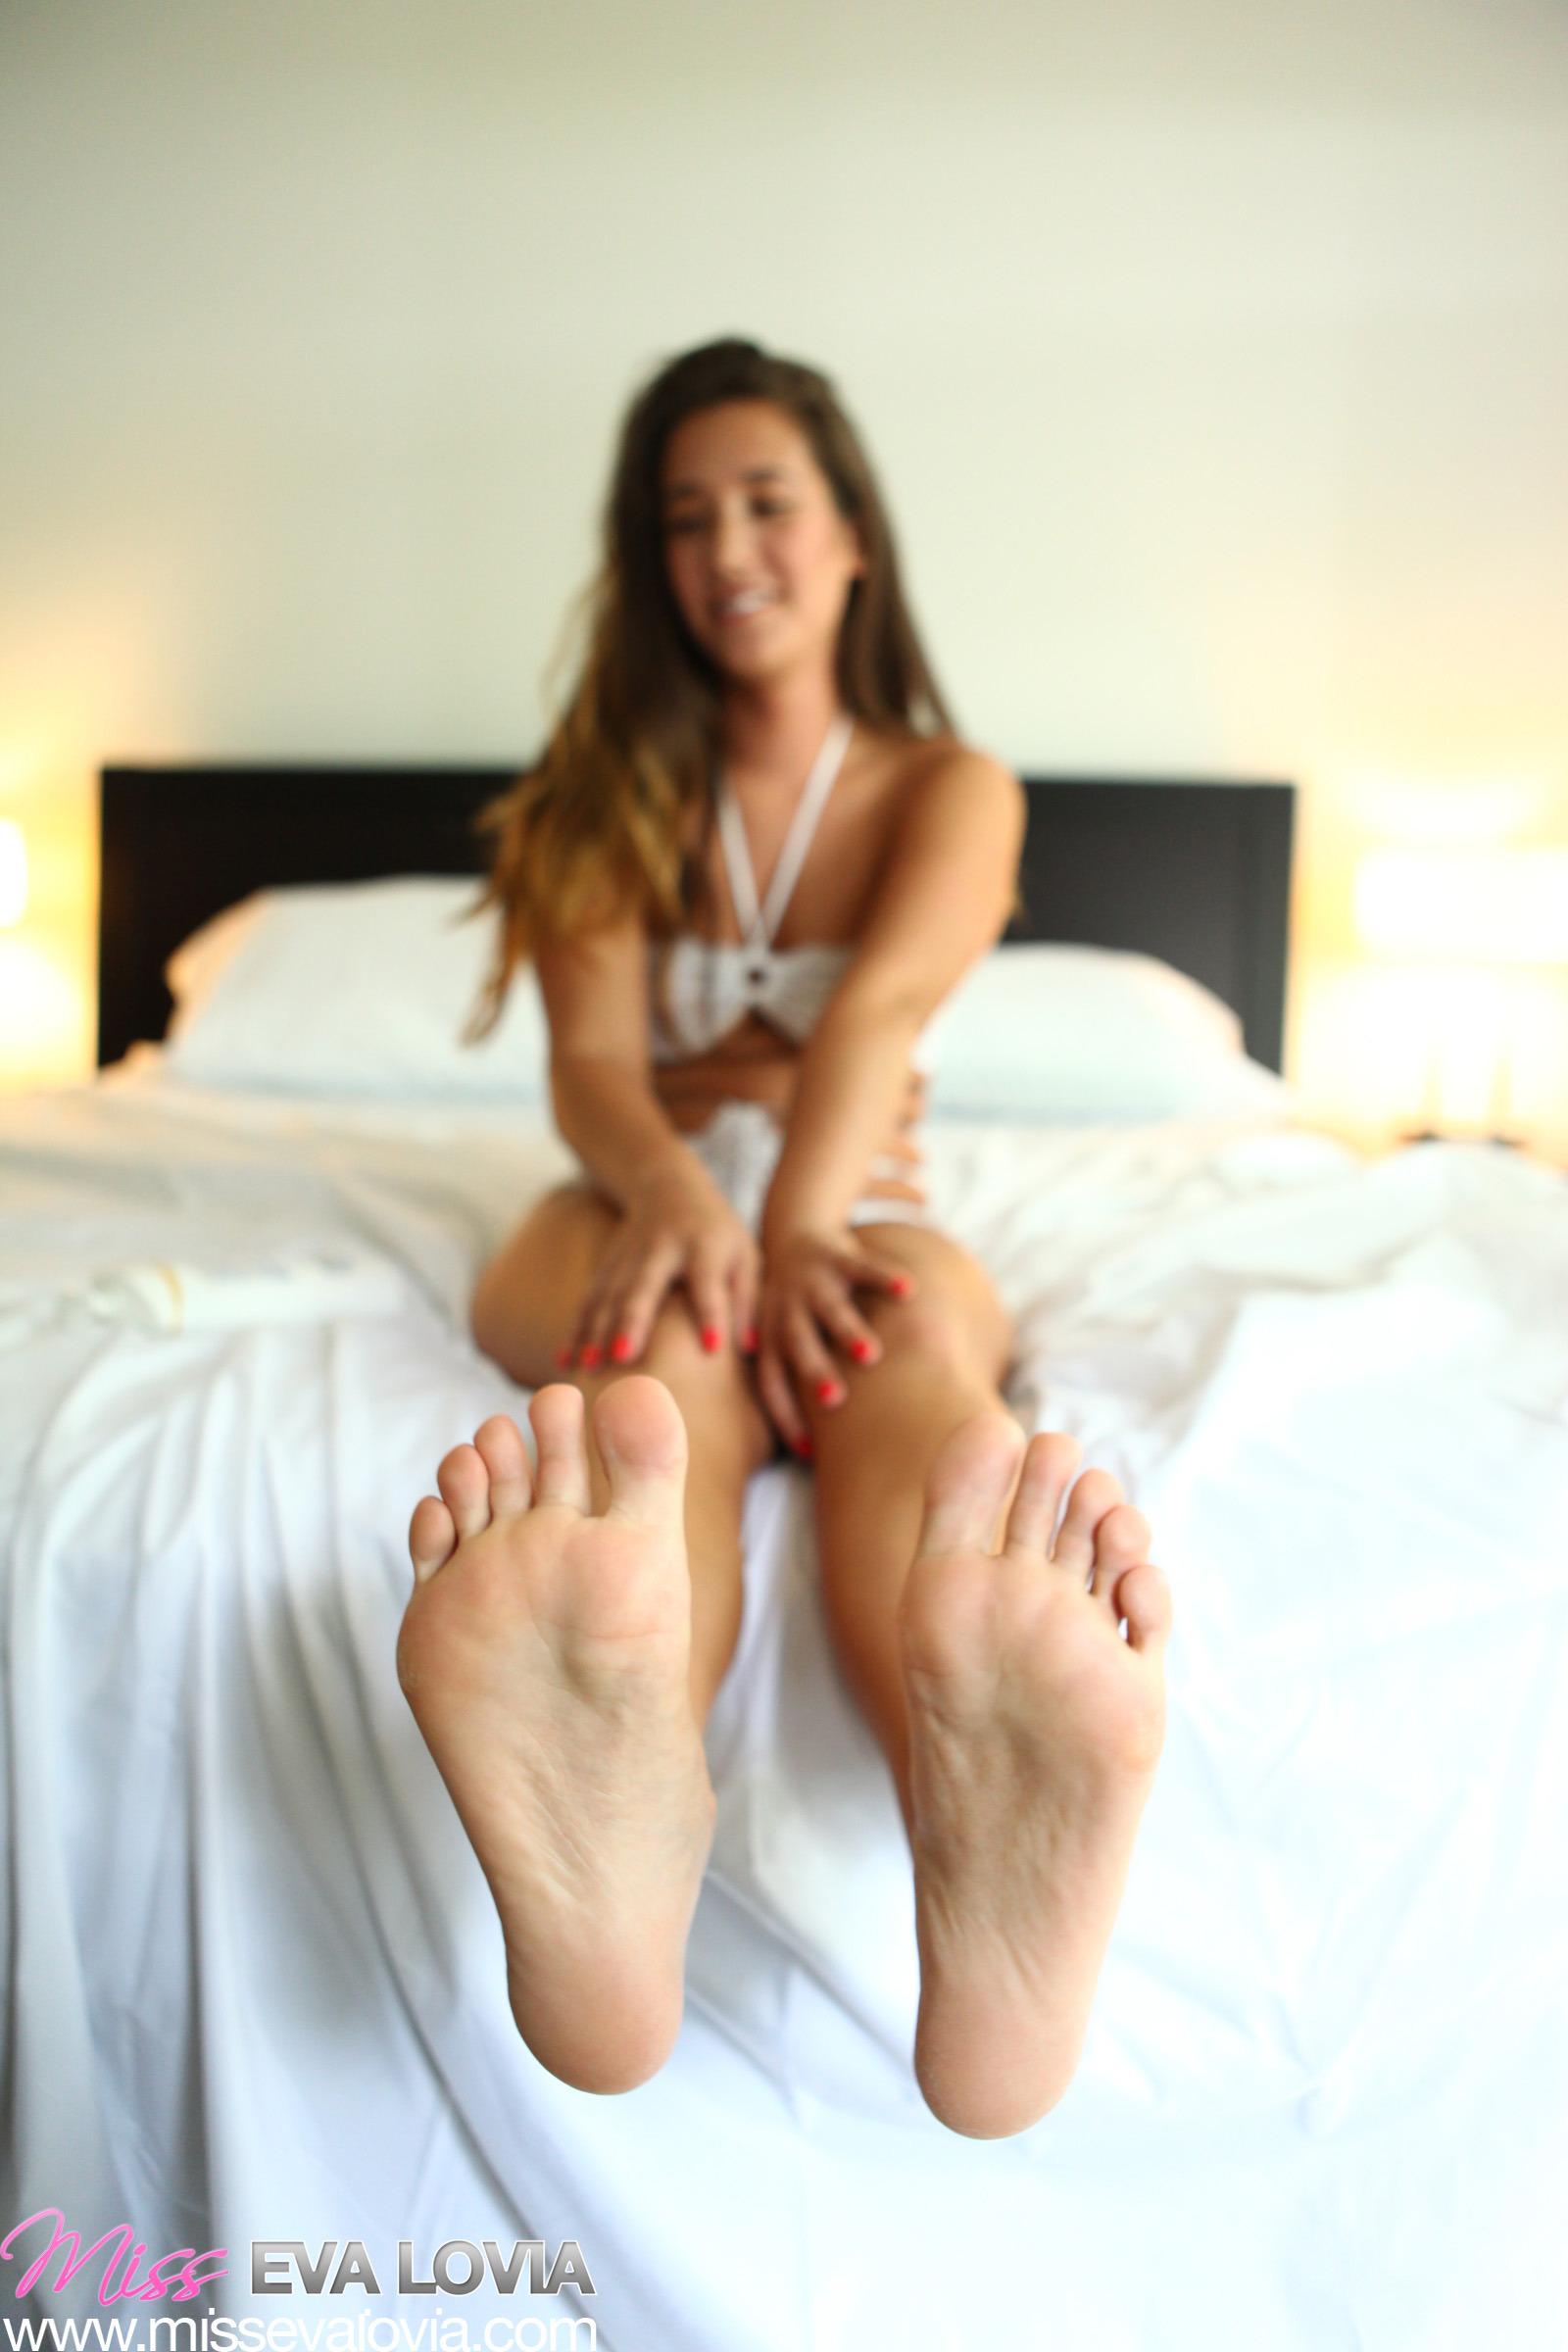 Eva lovia feet soles massage licking 10